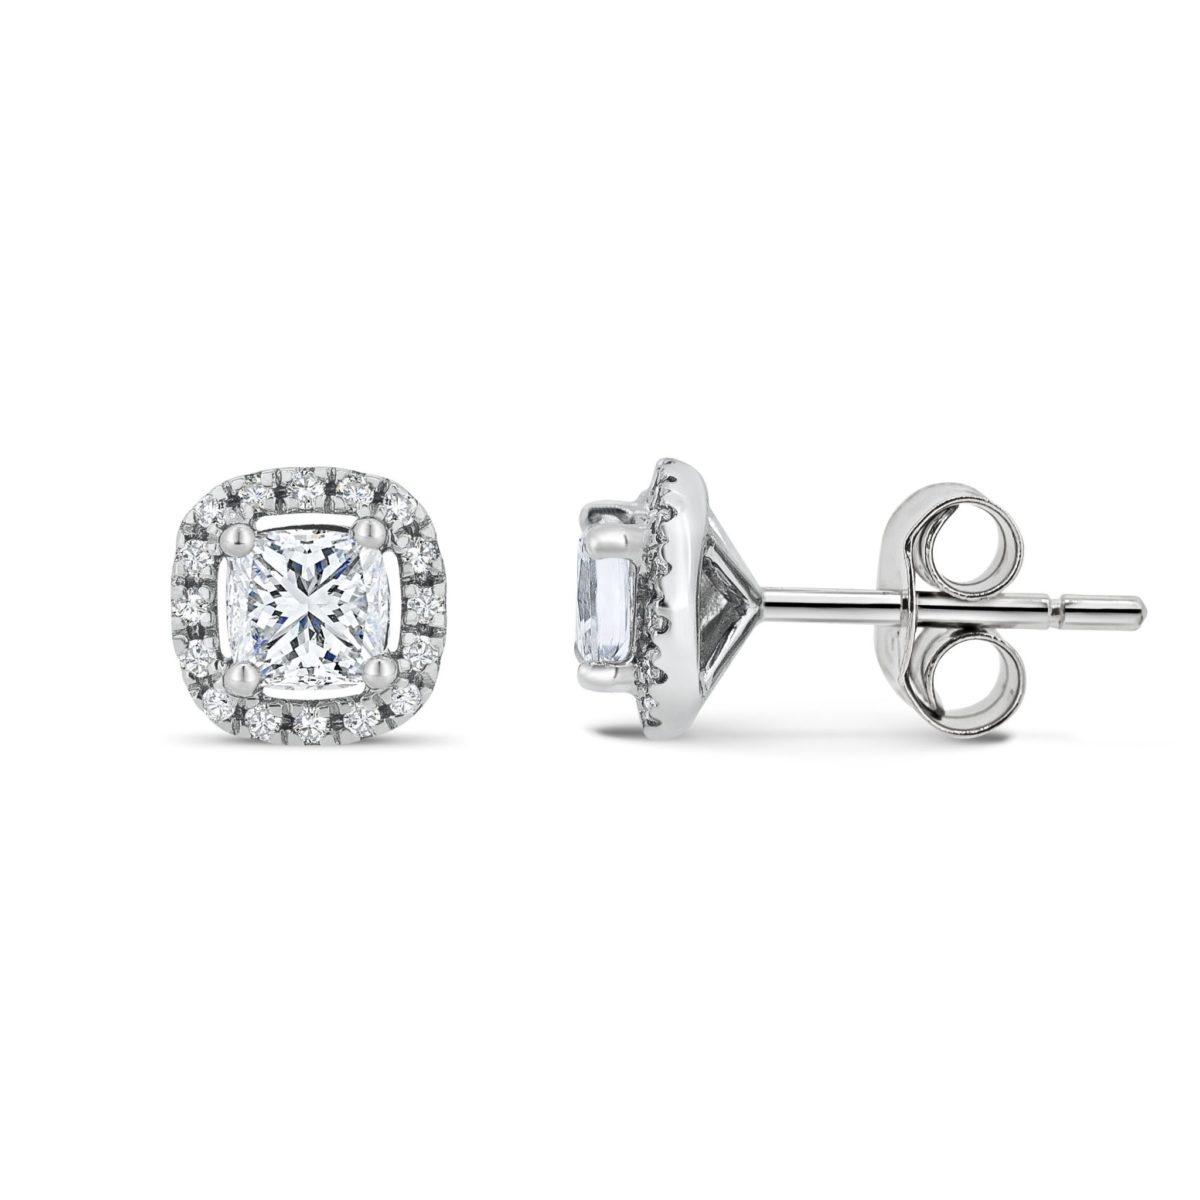 Lauren Cushion Cut Diamond Halo Mircoset Earrings